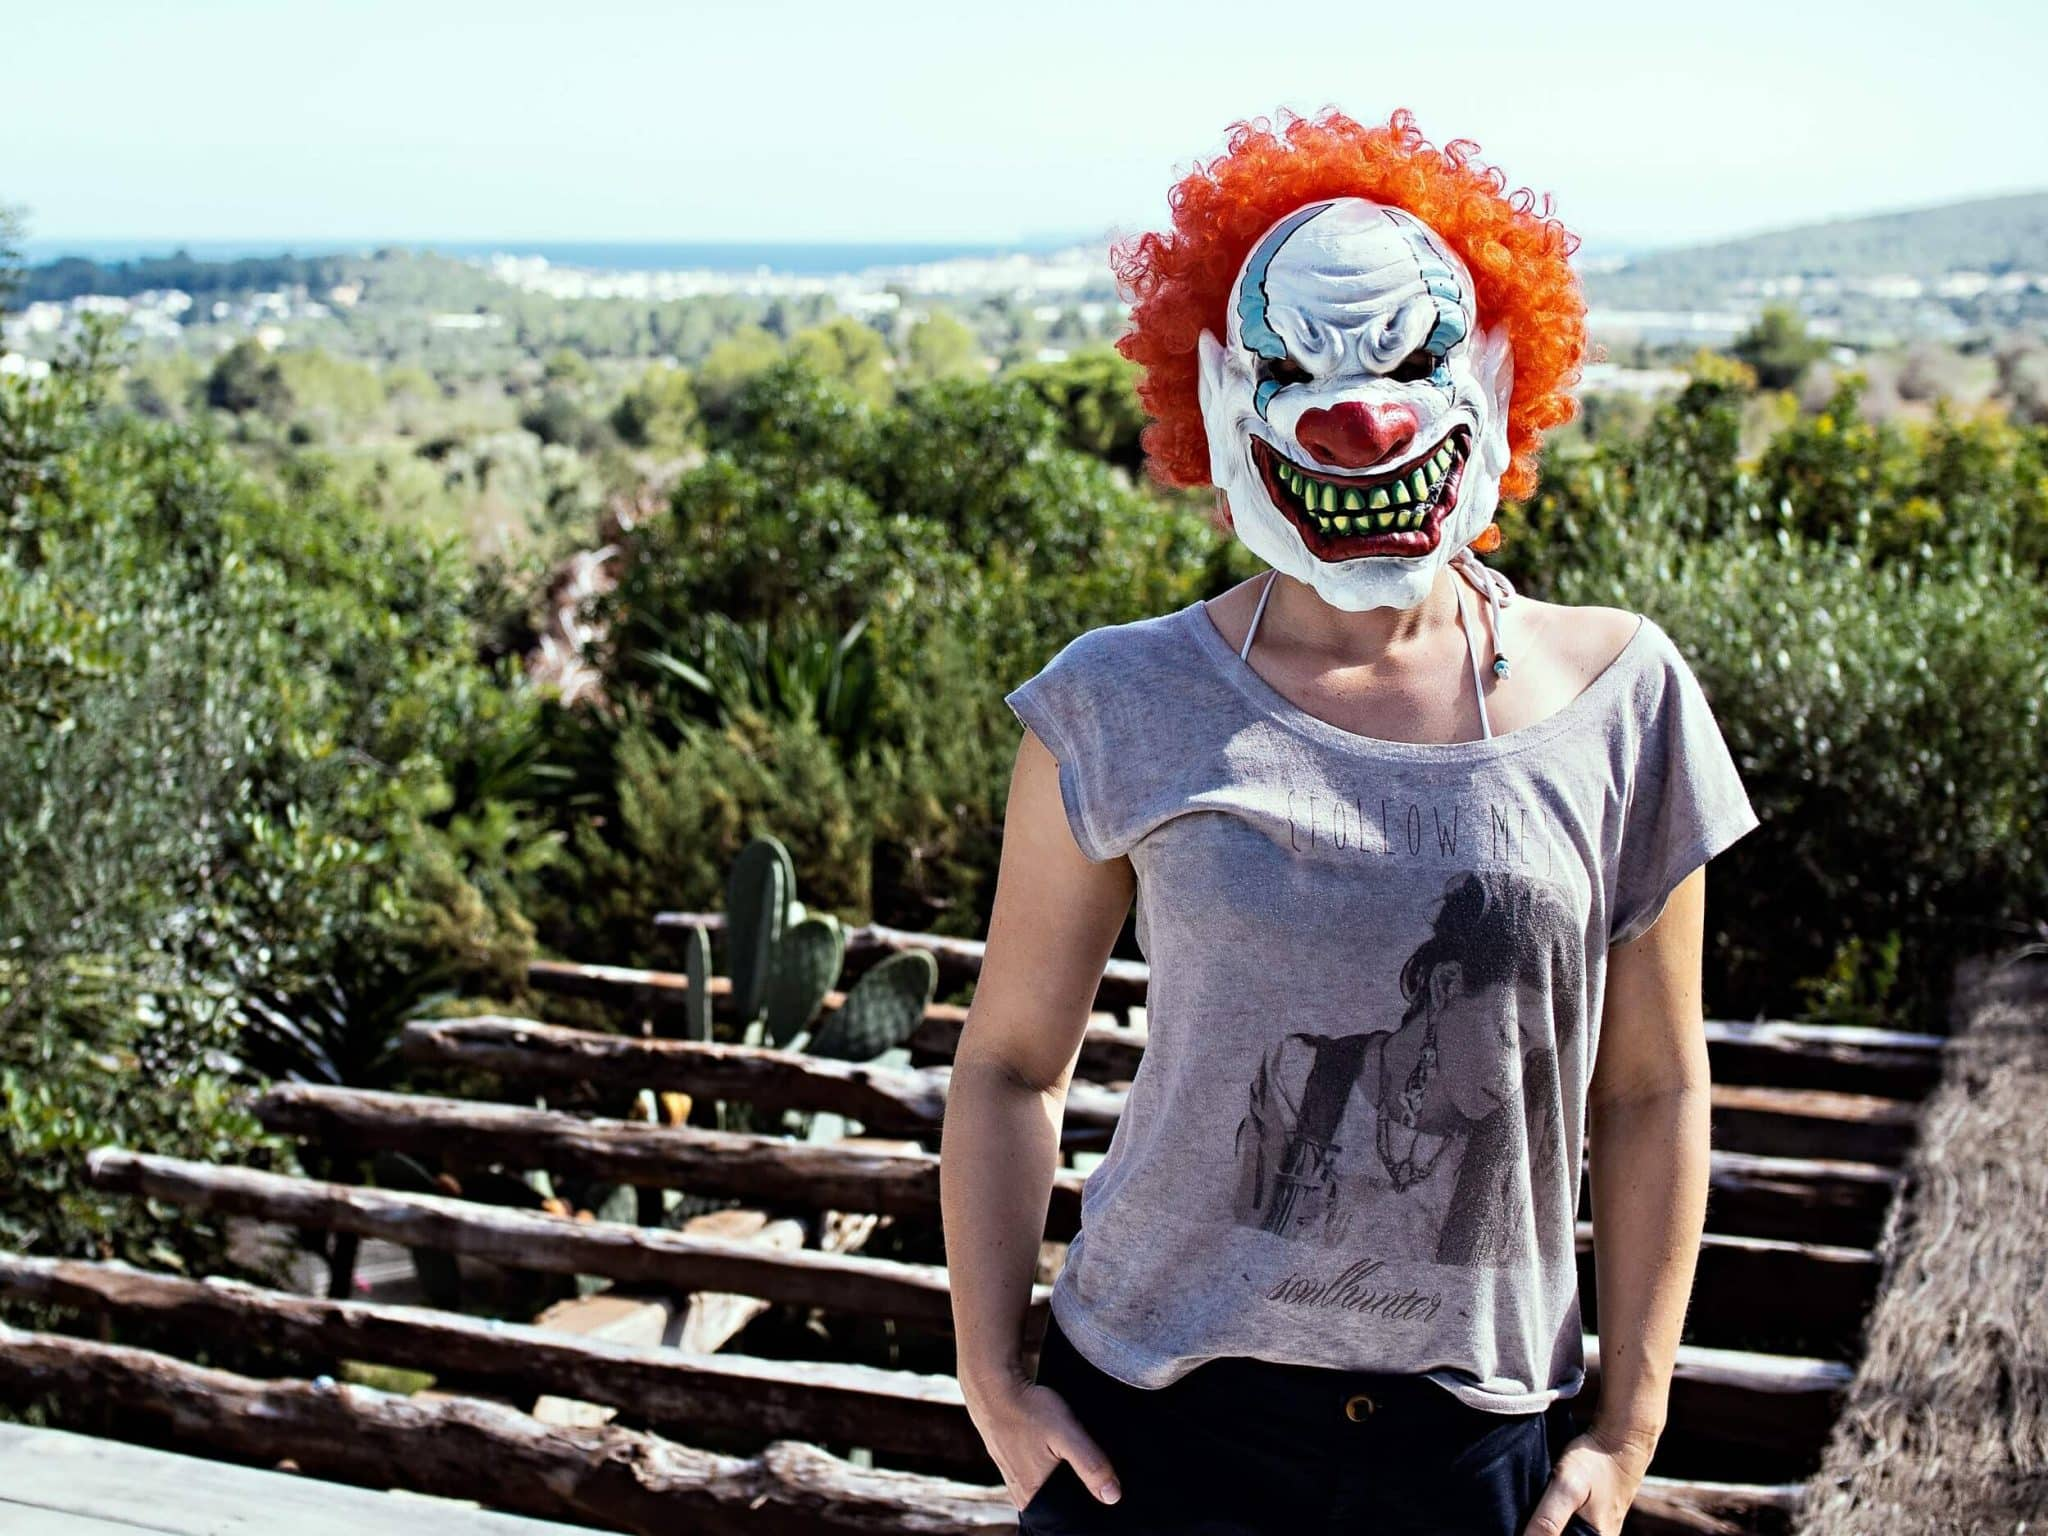 Clownery-Holger-Altgeld-016